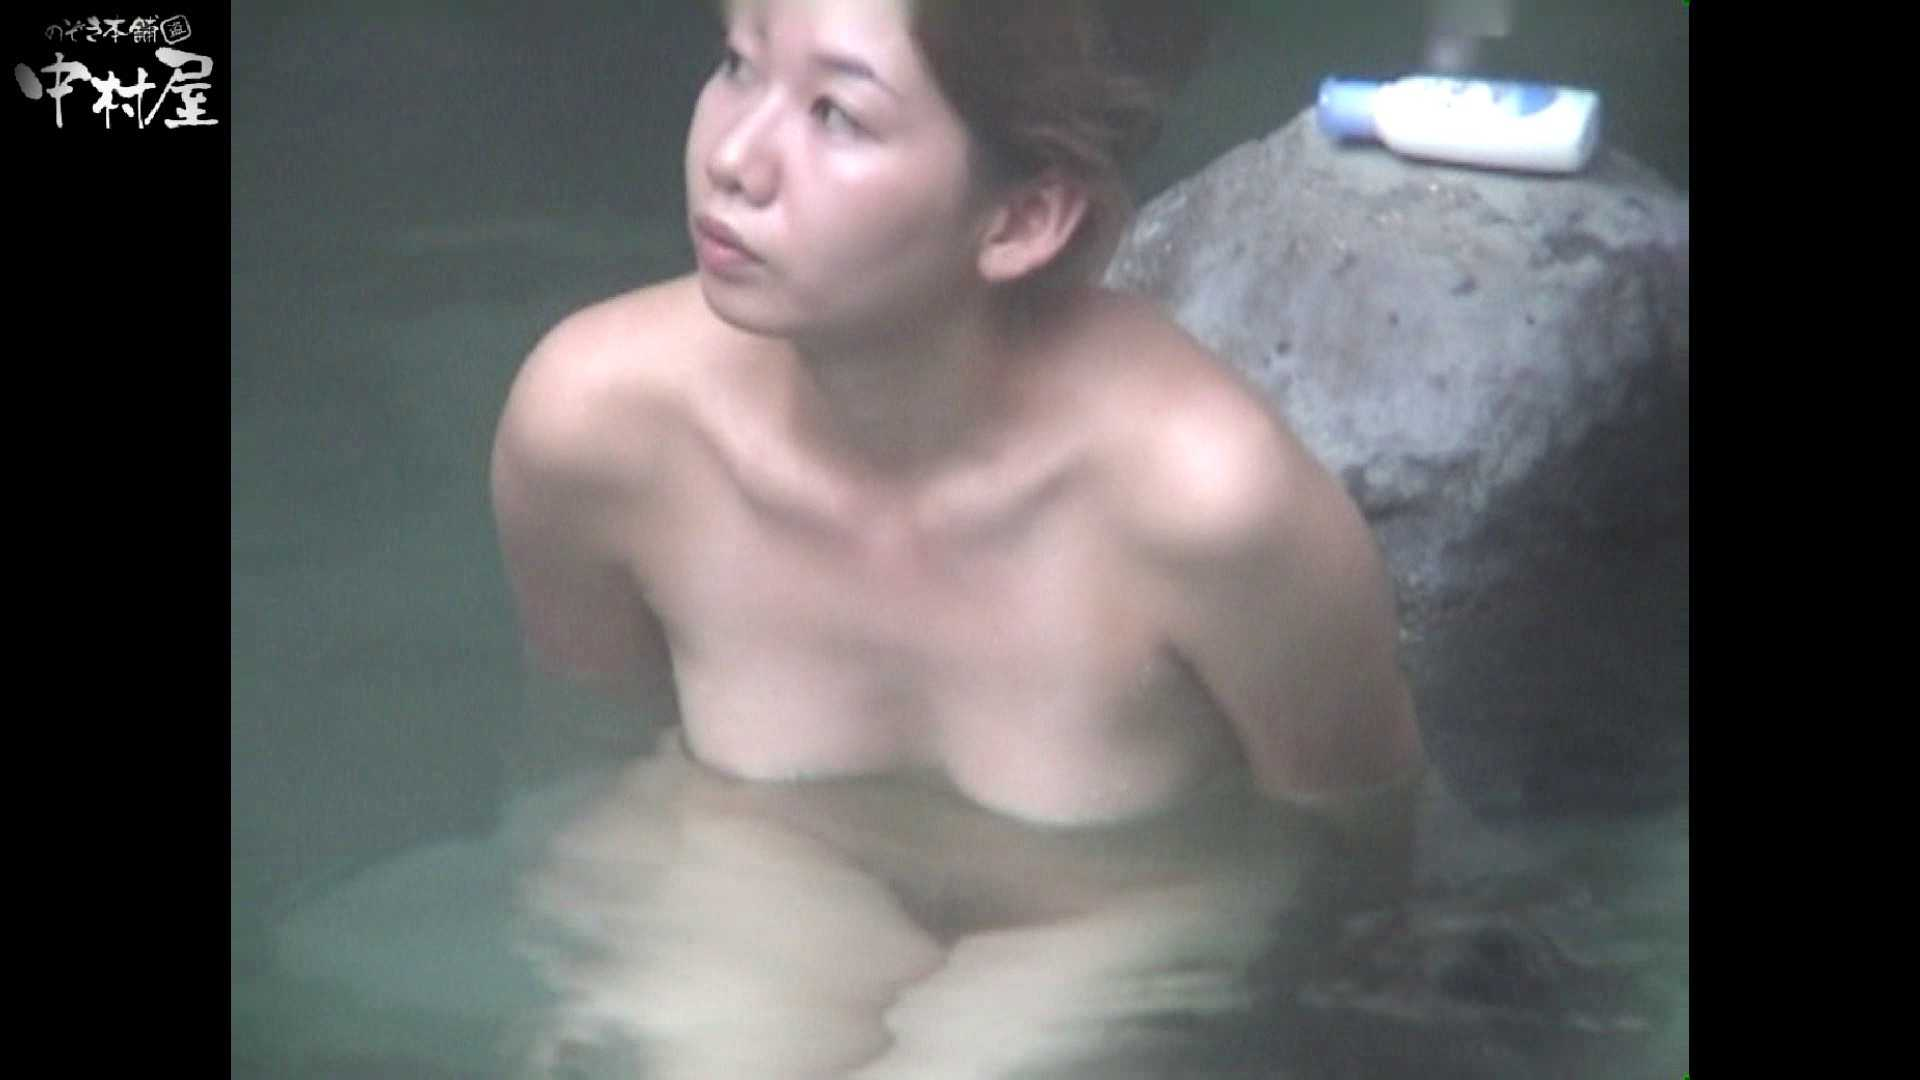 Aquaな露天風呂Vol.951 露天風呂 隠し撮りオマンコ動画紹介 80連発 47